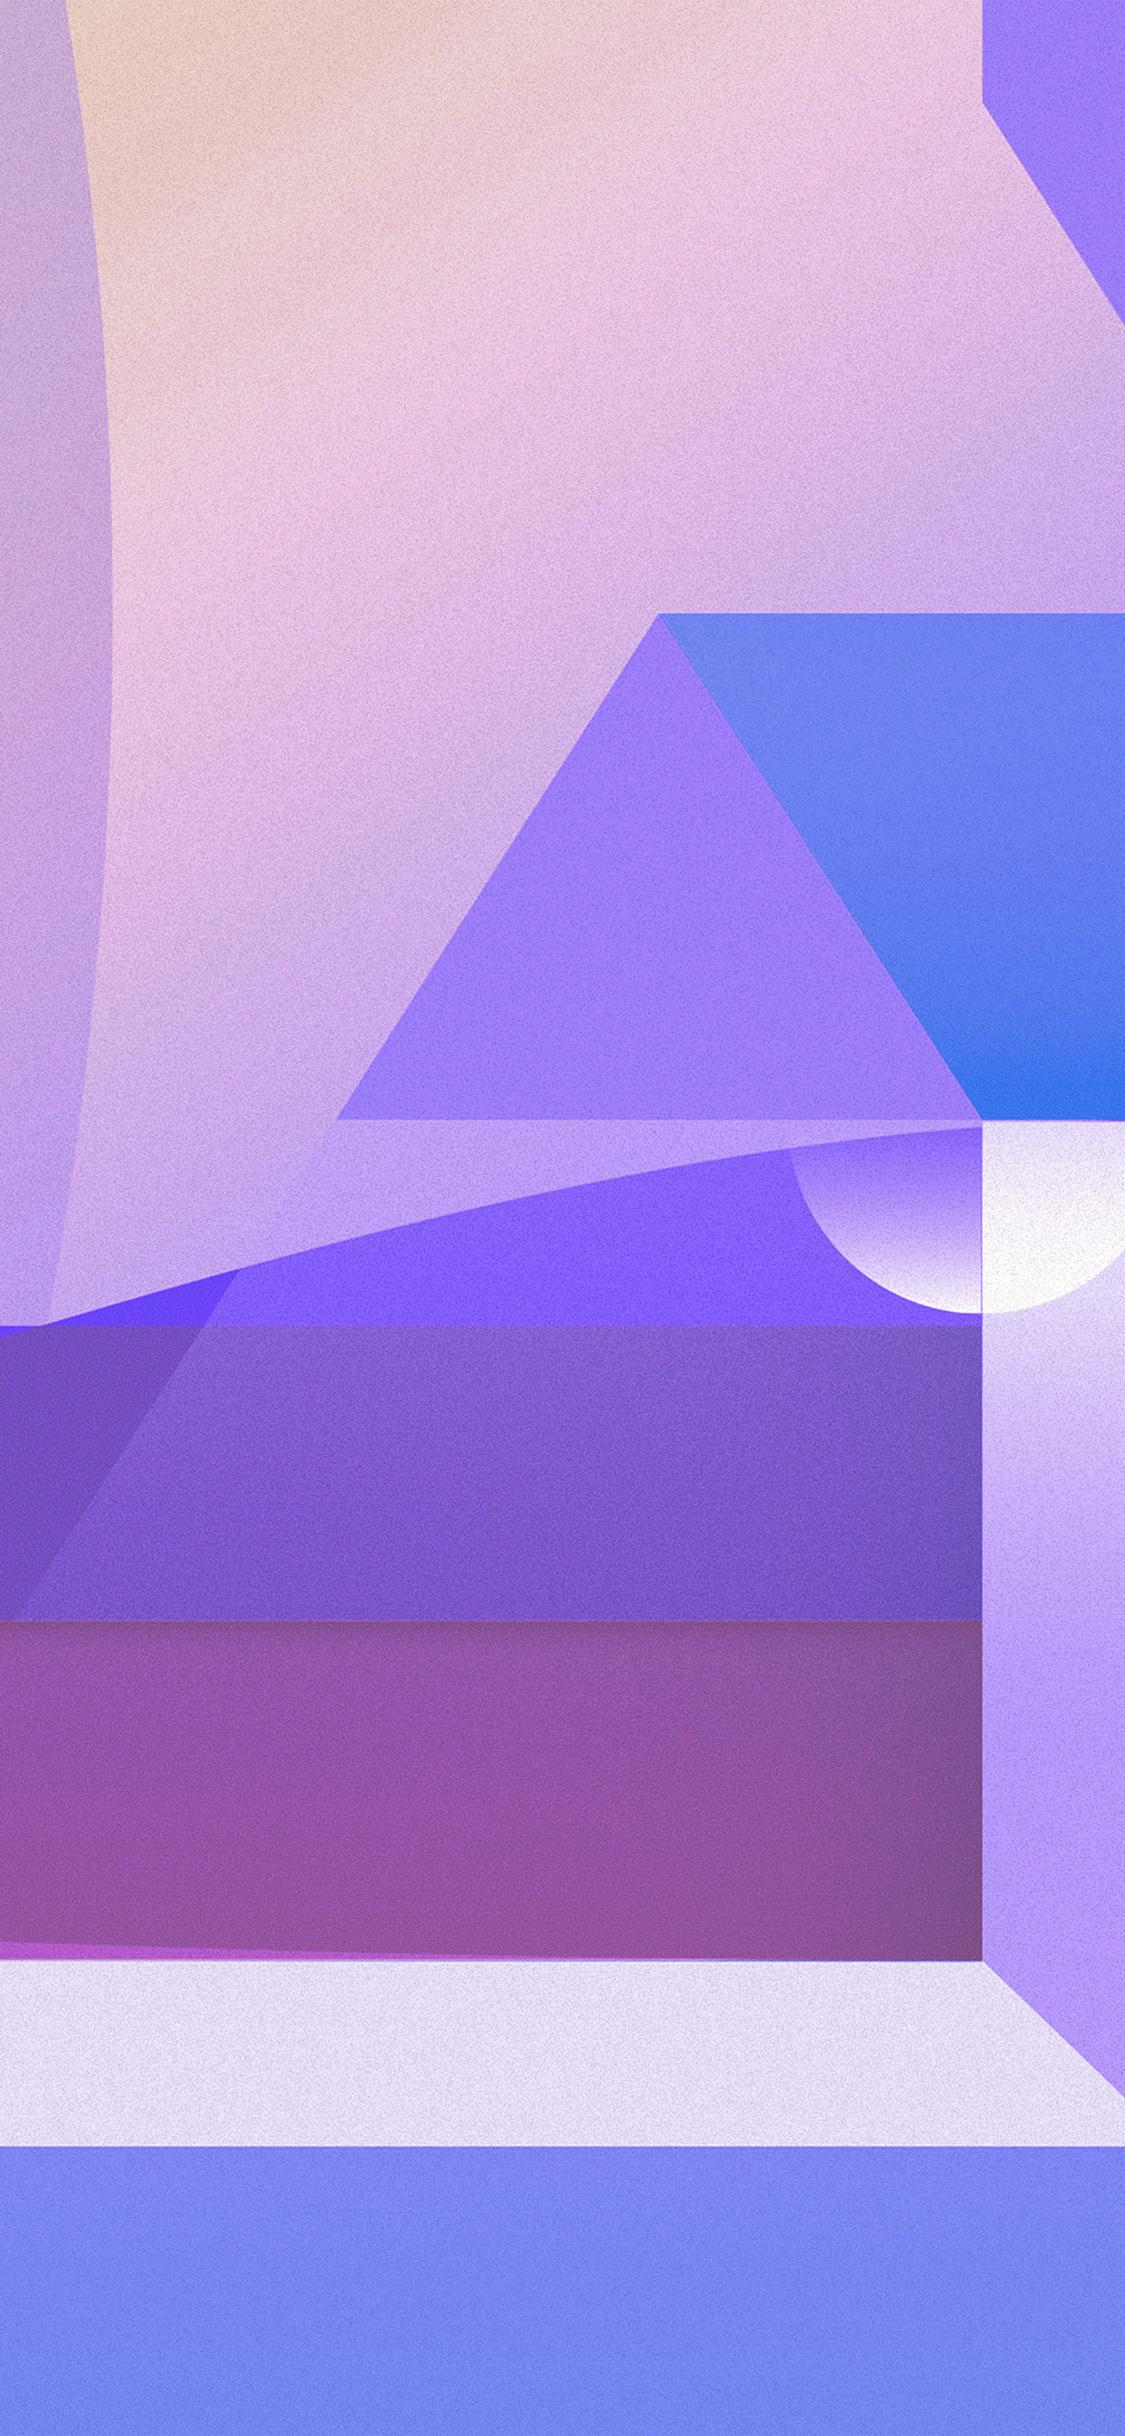 iPhonexpapers.com-Apple-iPhone-wallpaper-vx48-noise-simple-minimal-blue-soft-pastel-pattern-background